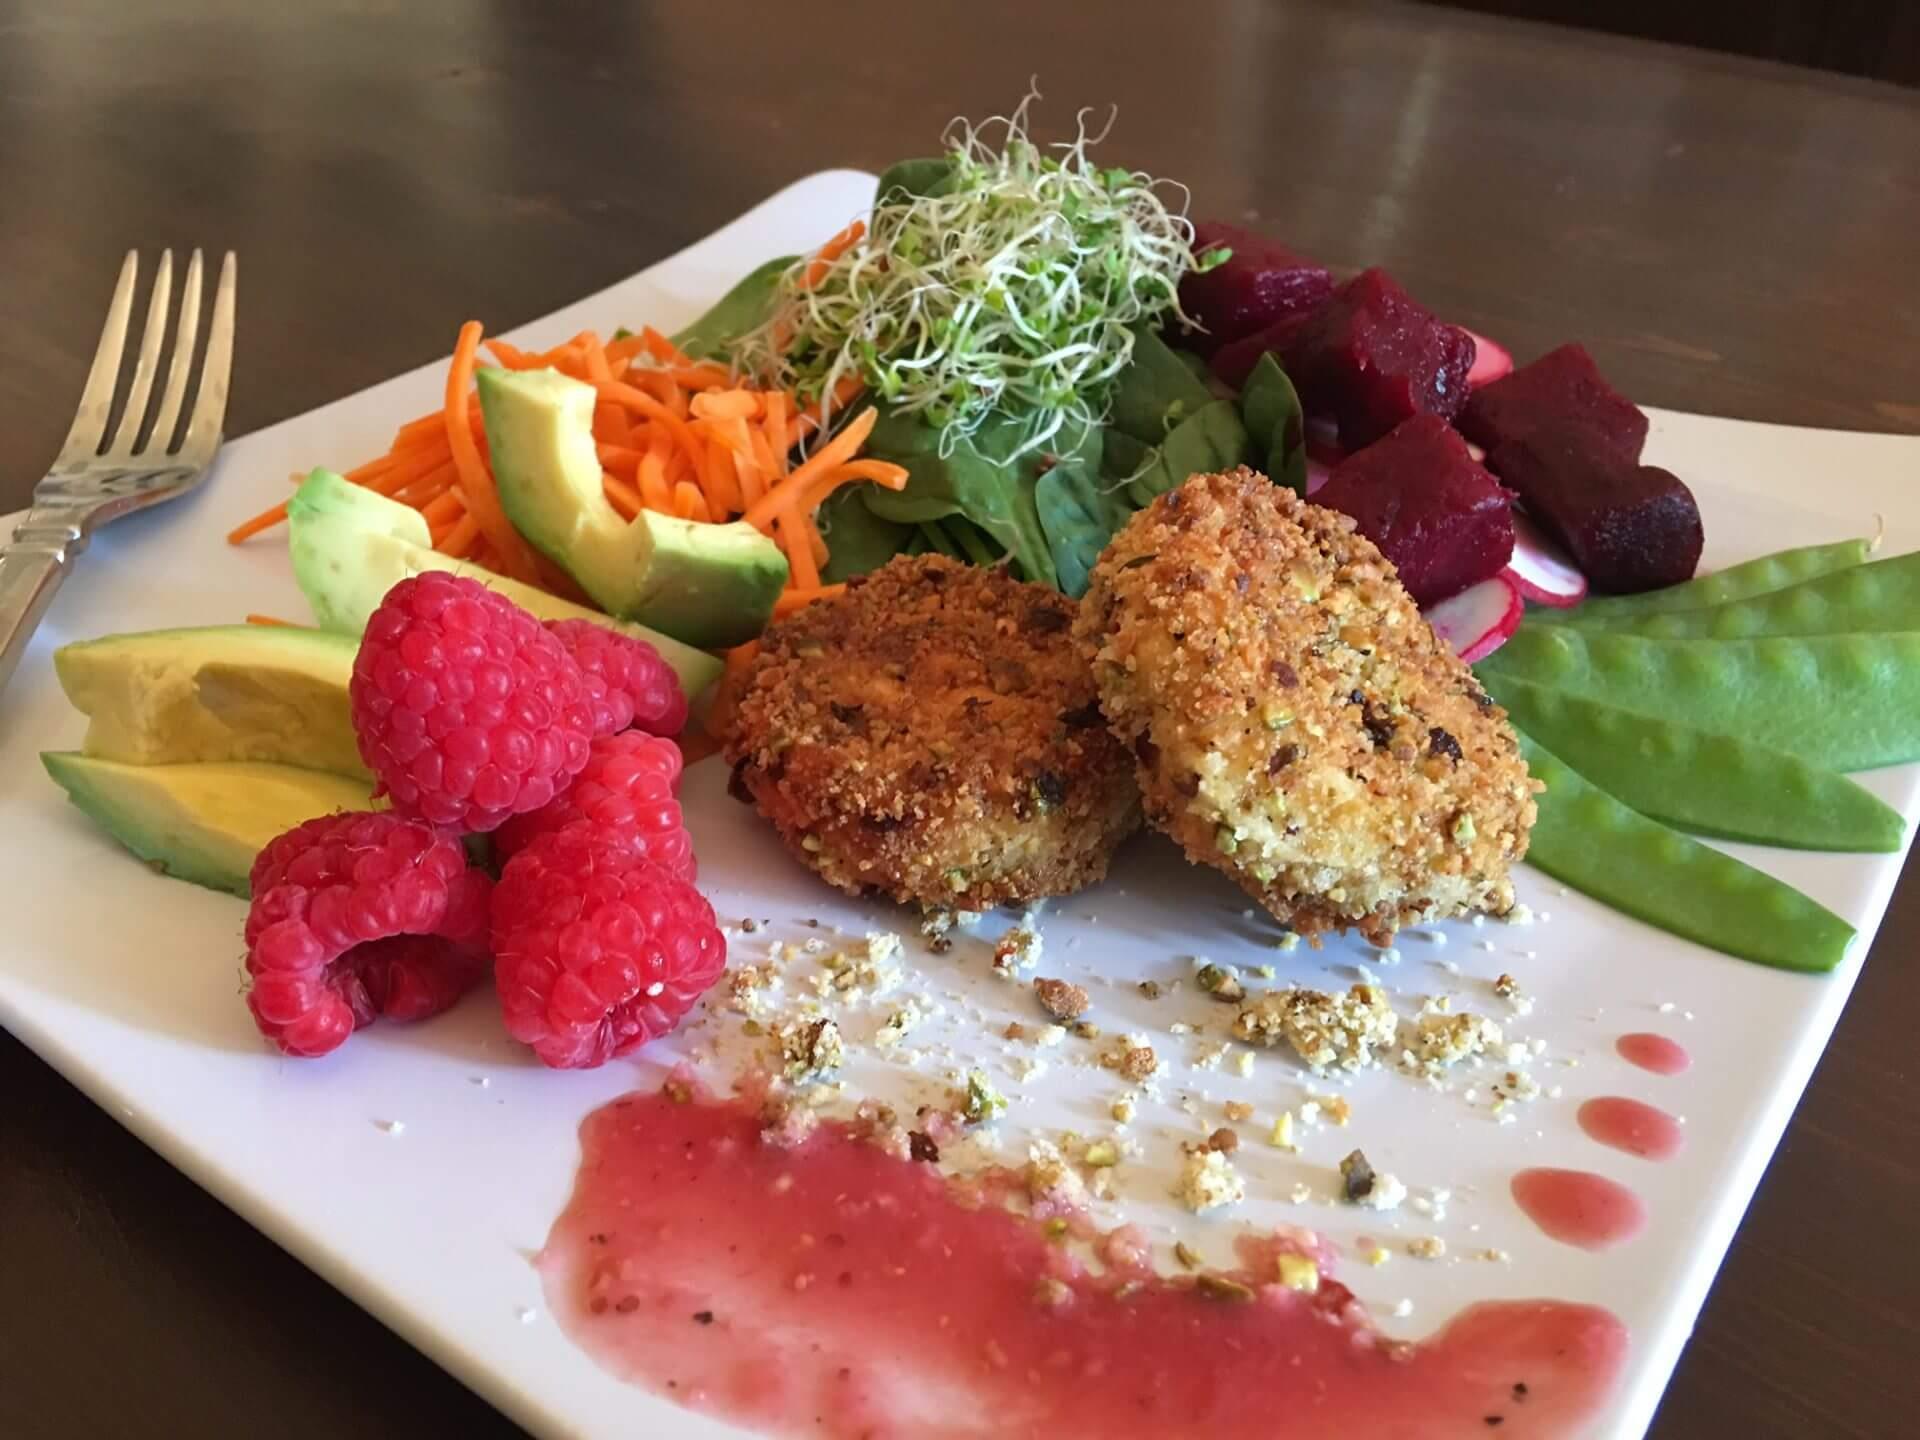 Raspberry & Goat Cheese Salad Recipe from Raspberry Grower Wish Farms